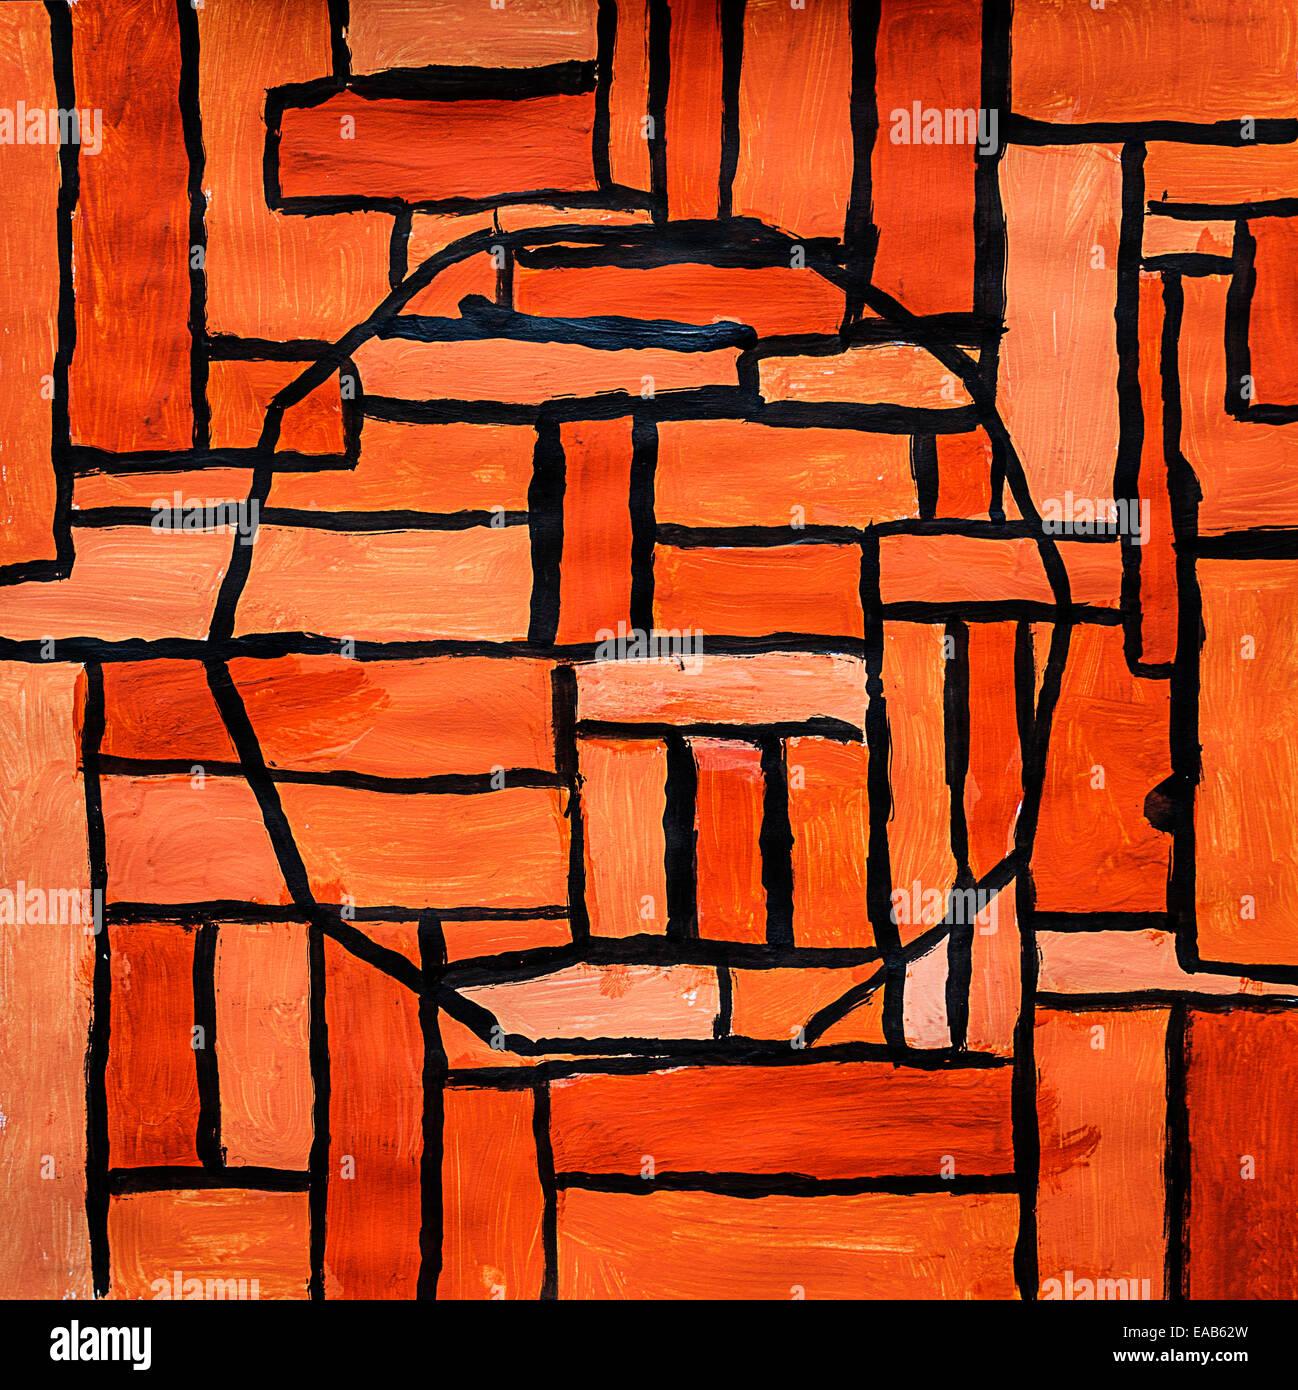 Child's art: geometric patterns. - Stock Image